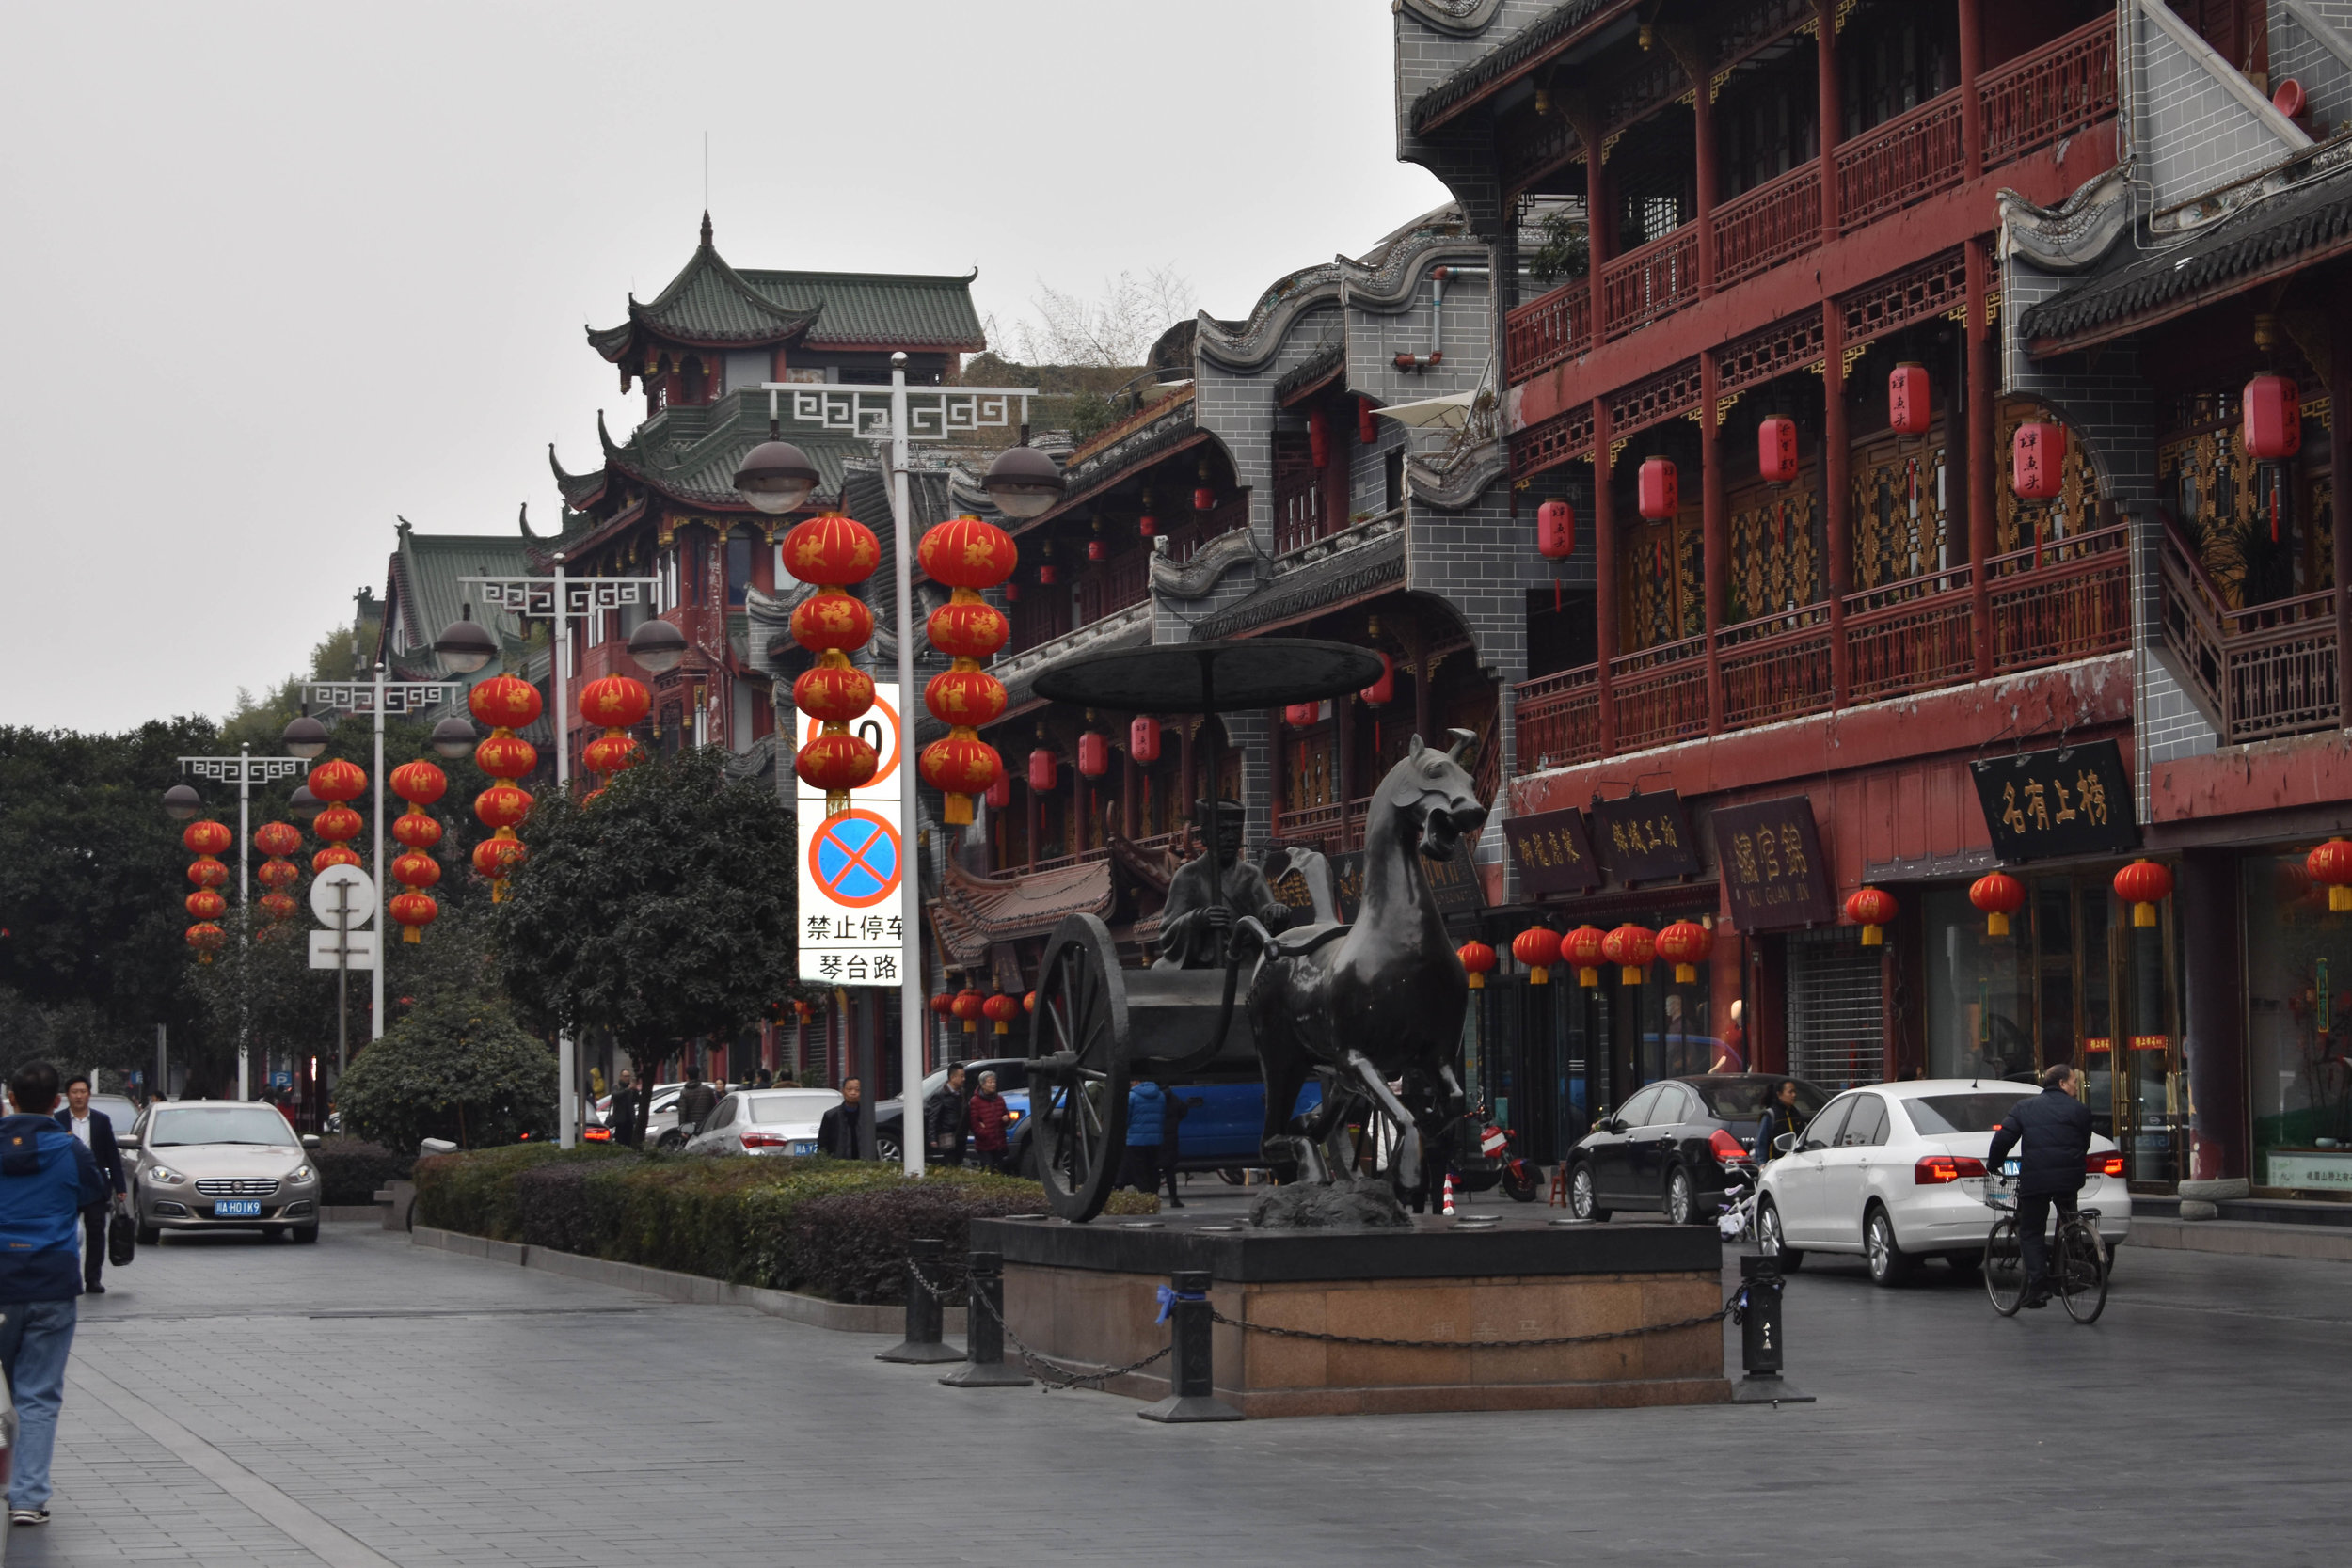 Quintai Rd Old Shopping District | Chengdu